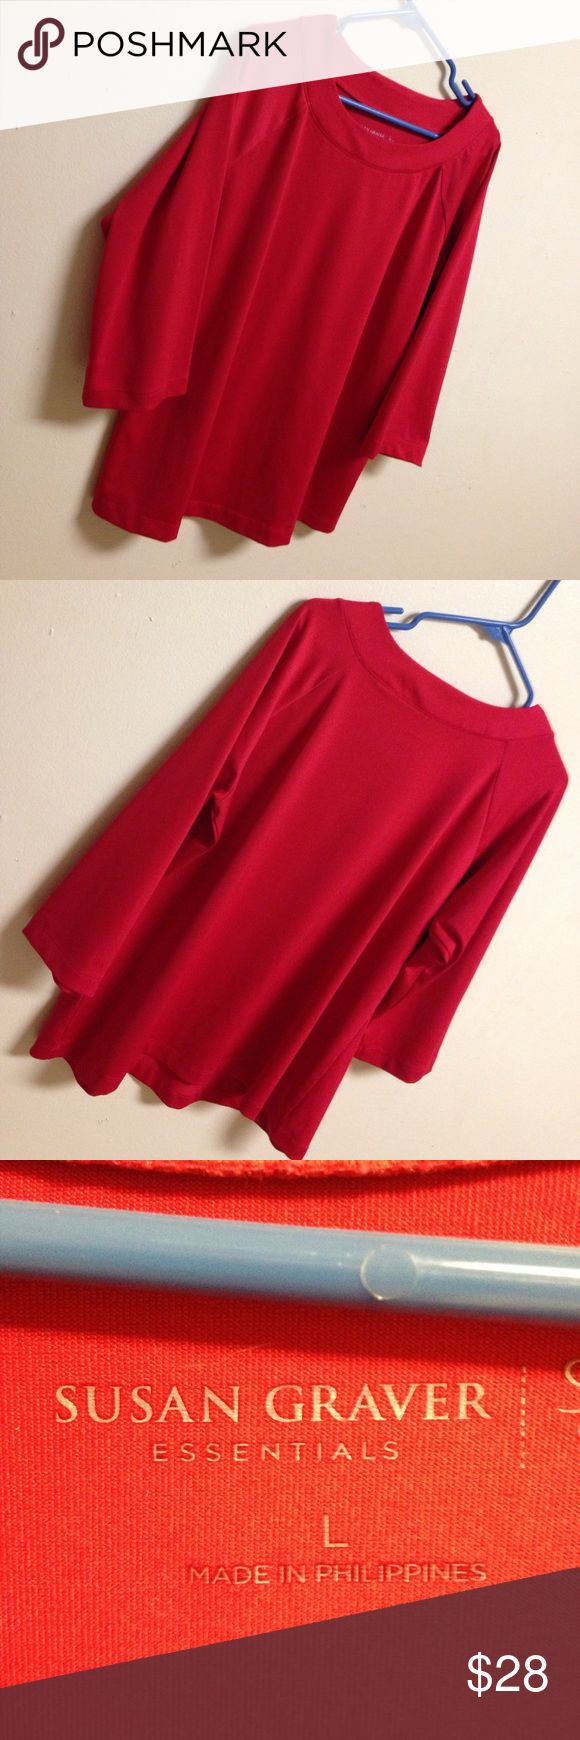 Like new Susan Gravers Women's L 3/4 sleeve Like new Red Women's L blouse by Susan Graver. Very nice and condition like new. Susan Graver Tops Blouses